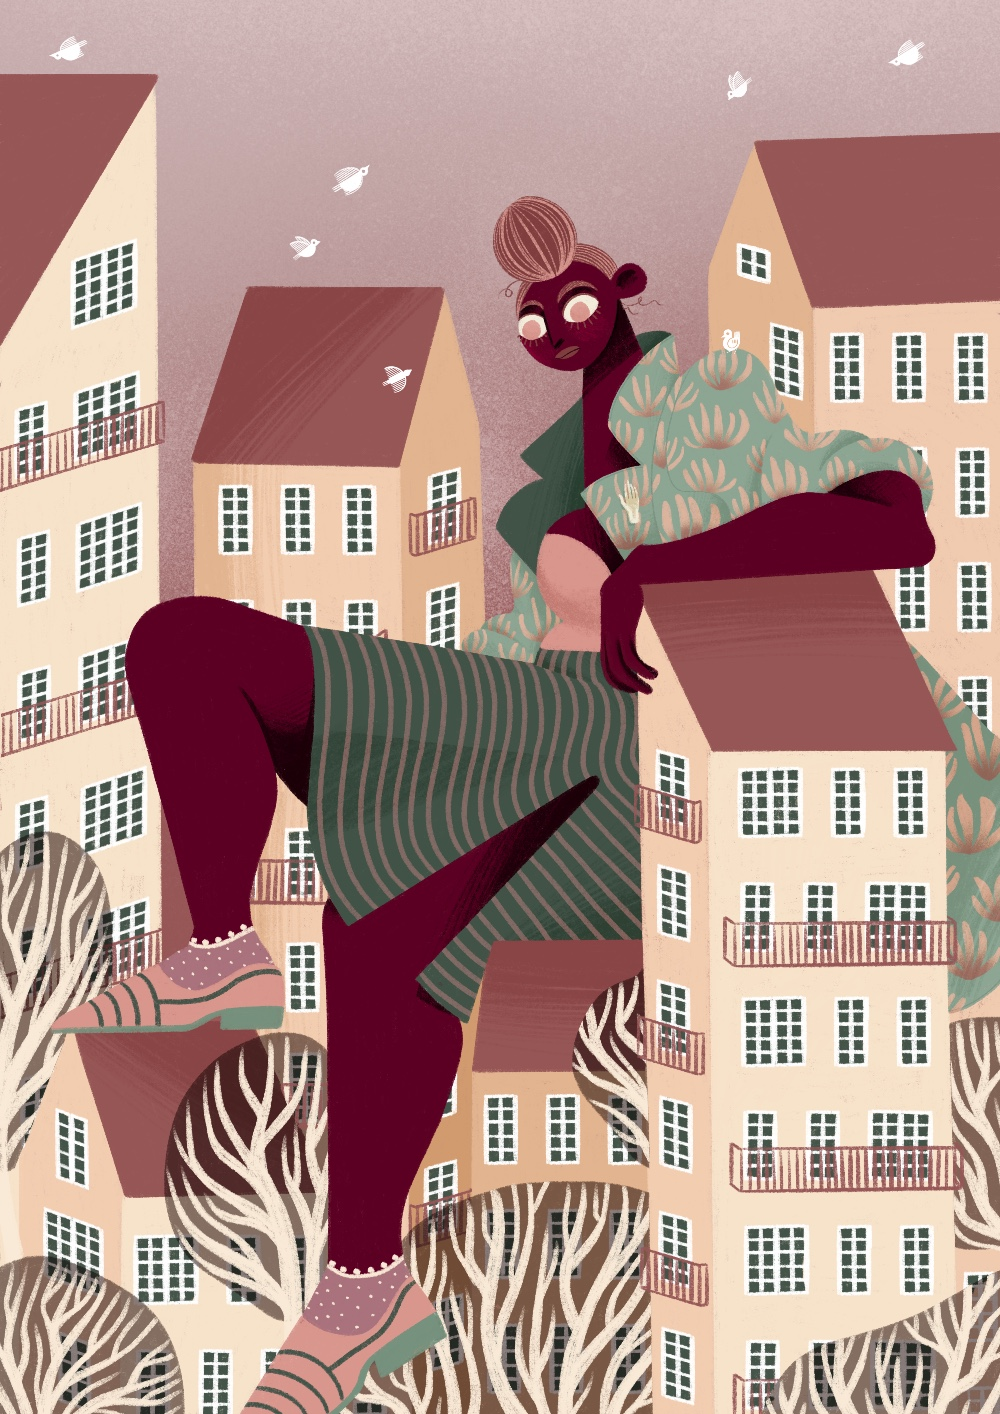 Outgrown by Iris van den Akker